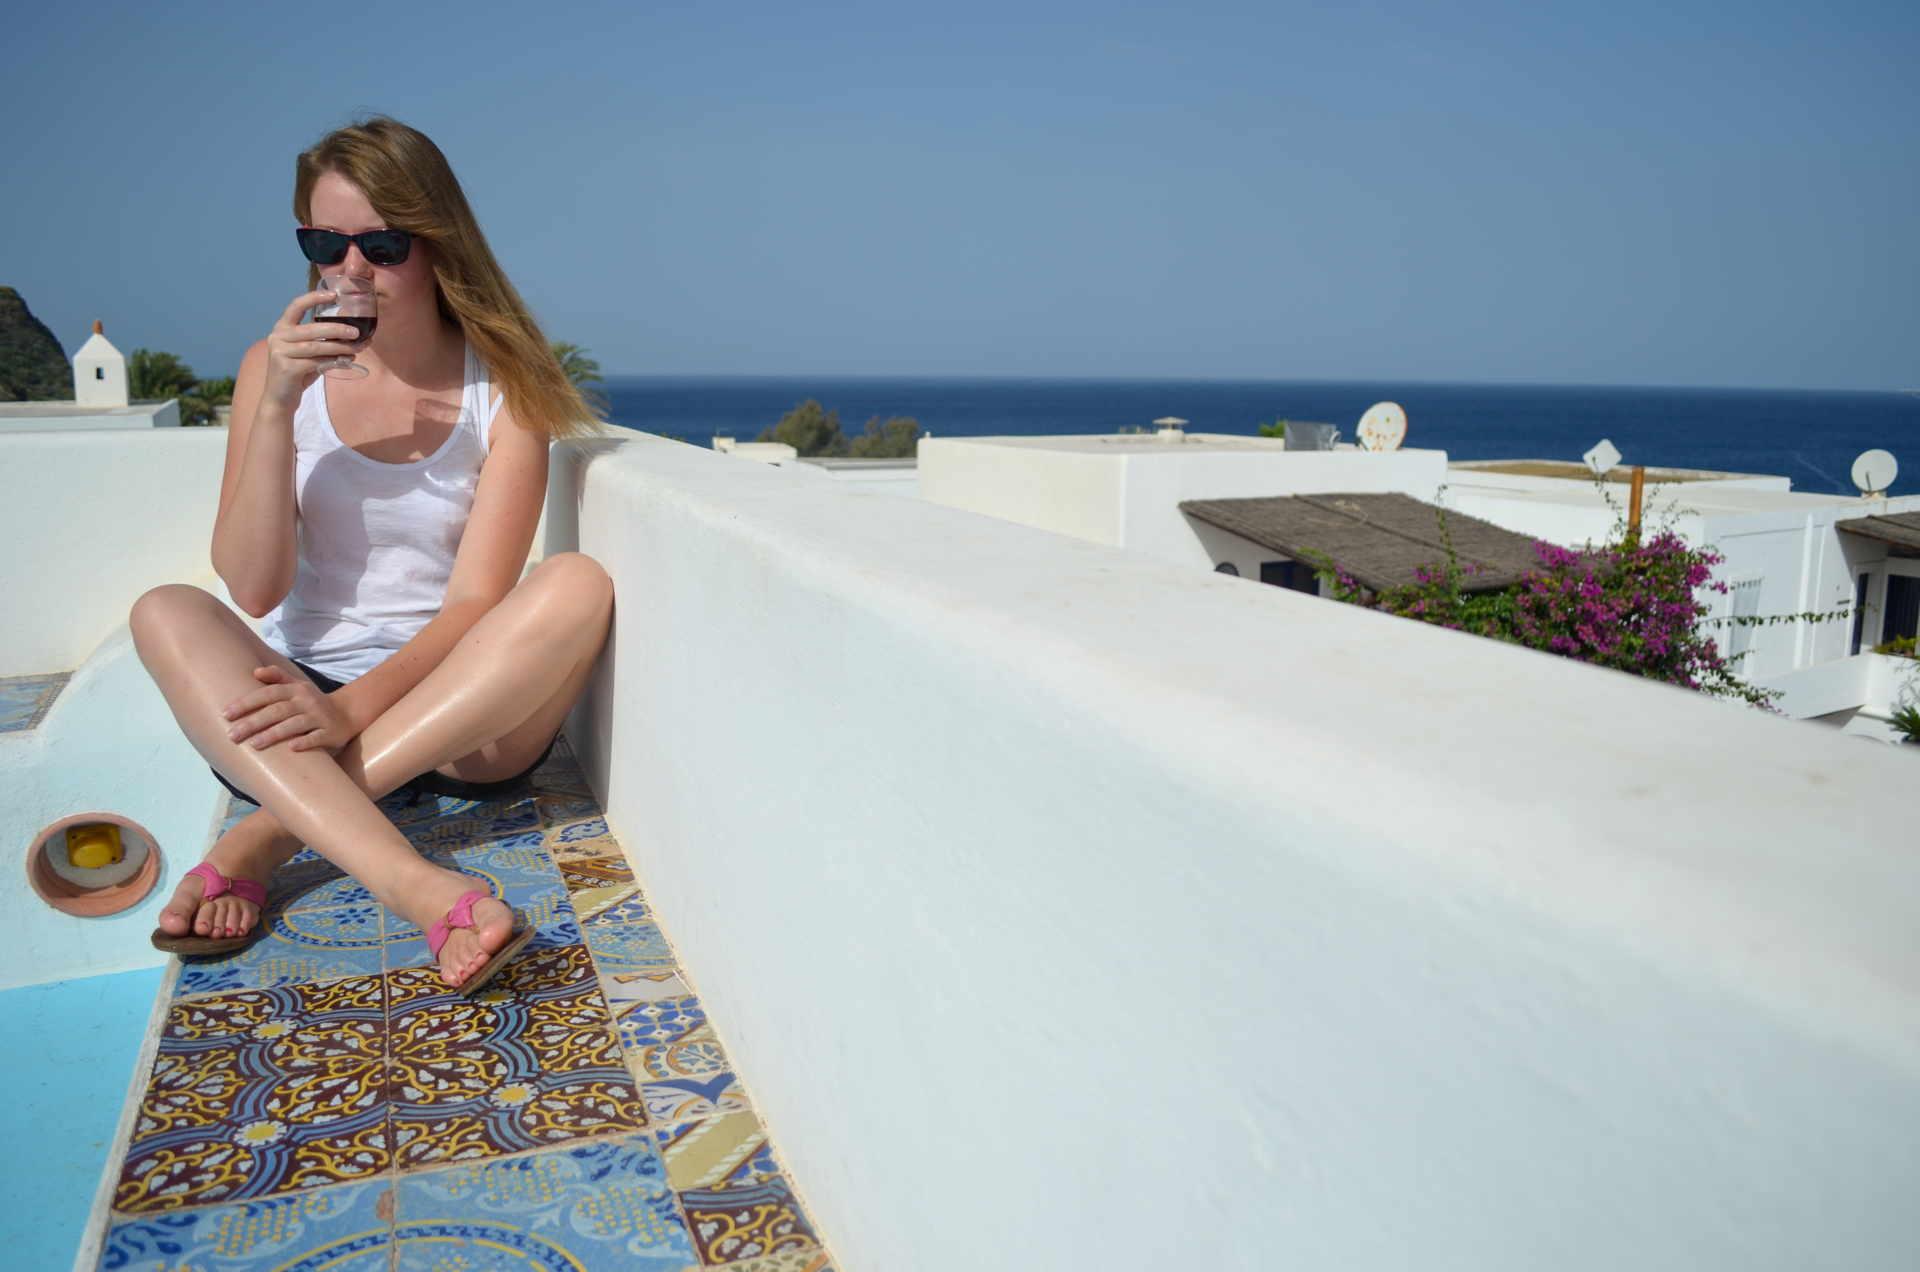 casa del sole stromboli, strombol where to stay, best accommodation stromboli, travel stromboli, aeolian islands travel guide